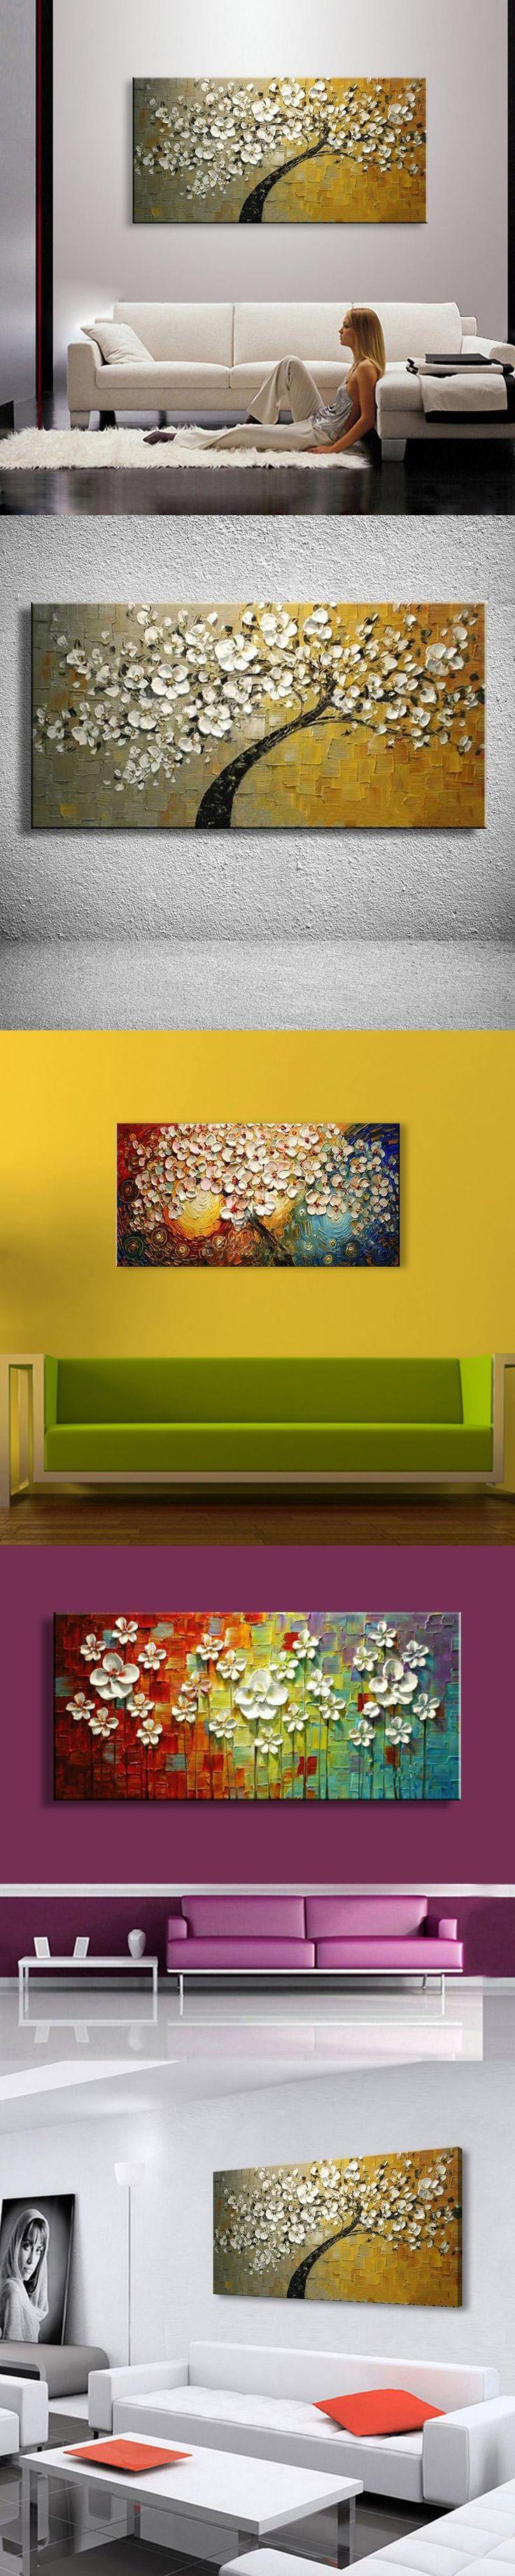 1096 best Home Decor images on Pinterest